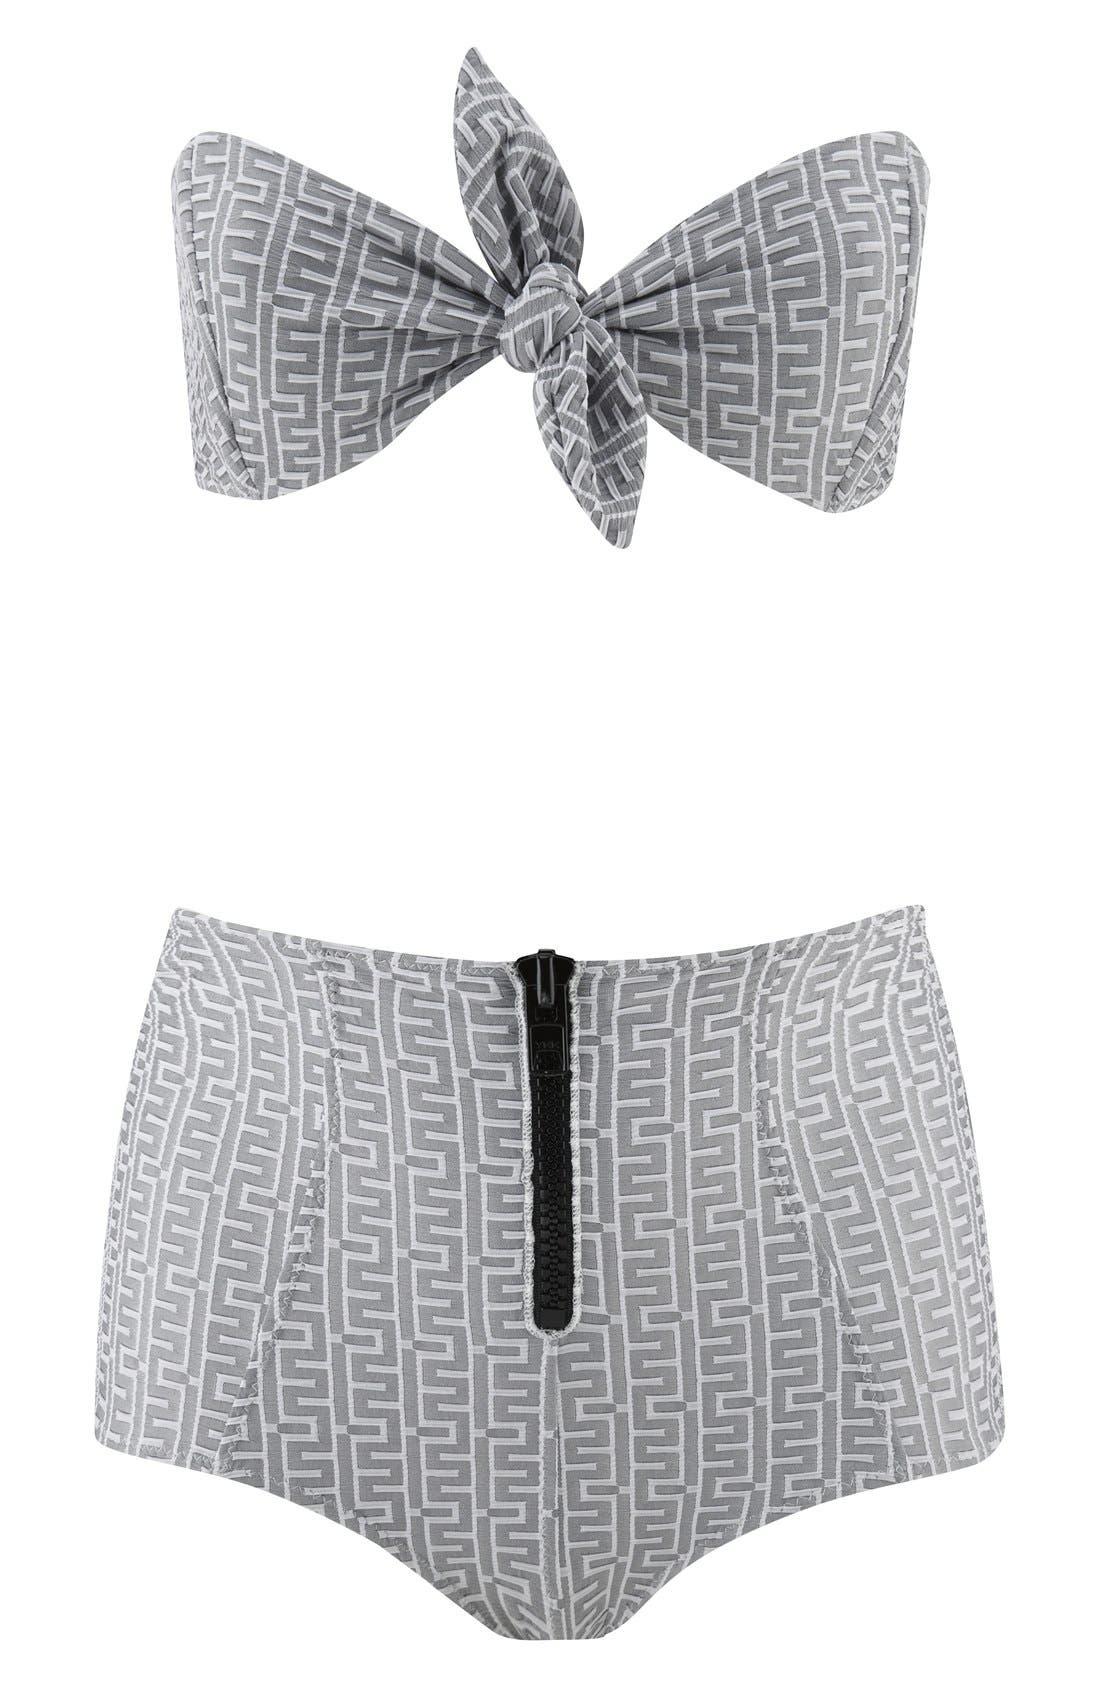 Alternate Image 1 Selected - Lisa Marie Fernandez 'Poppy' Zip High Waist Bikini